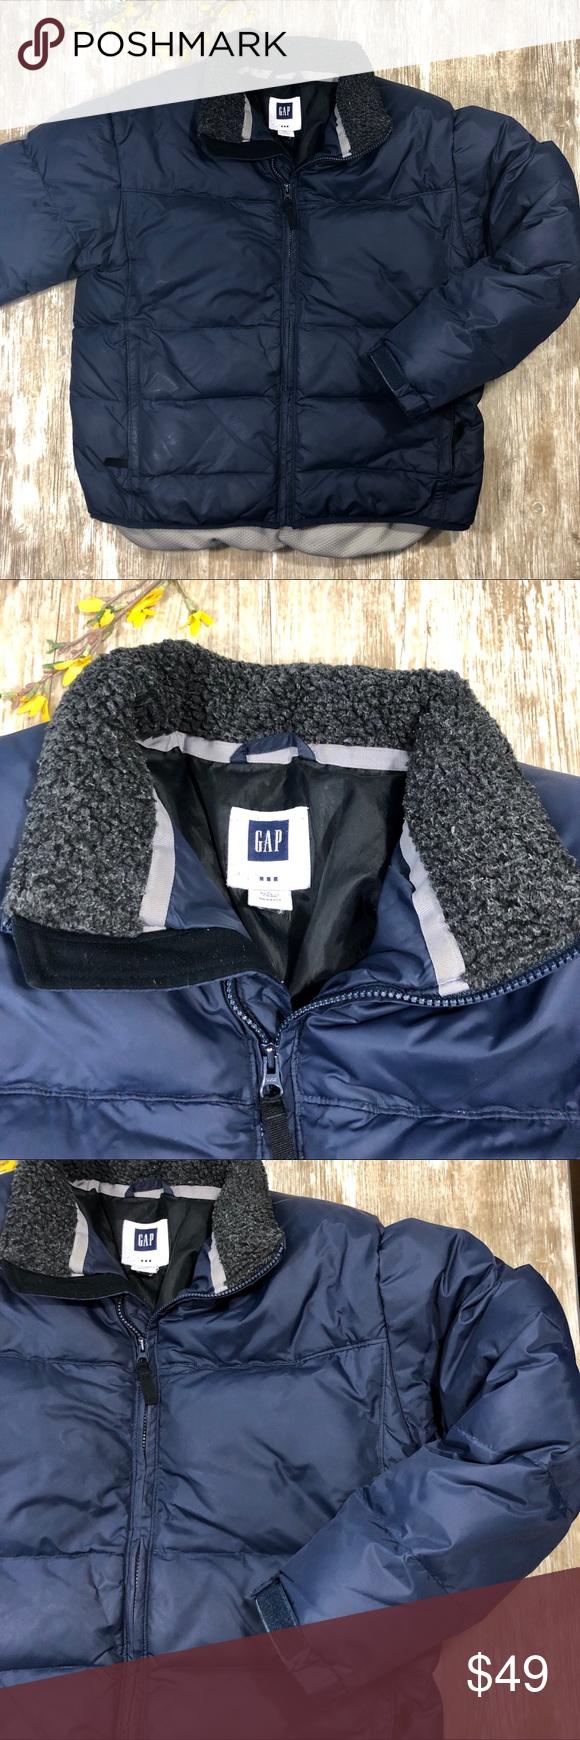 Gap Mens Down Insulated Puffer Winter Coat Winter Coat Clothes Design Winter Puffer Jackets [ 1740 x 580 Pixel ]